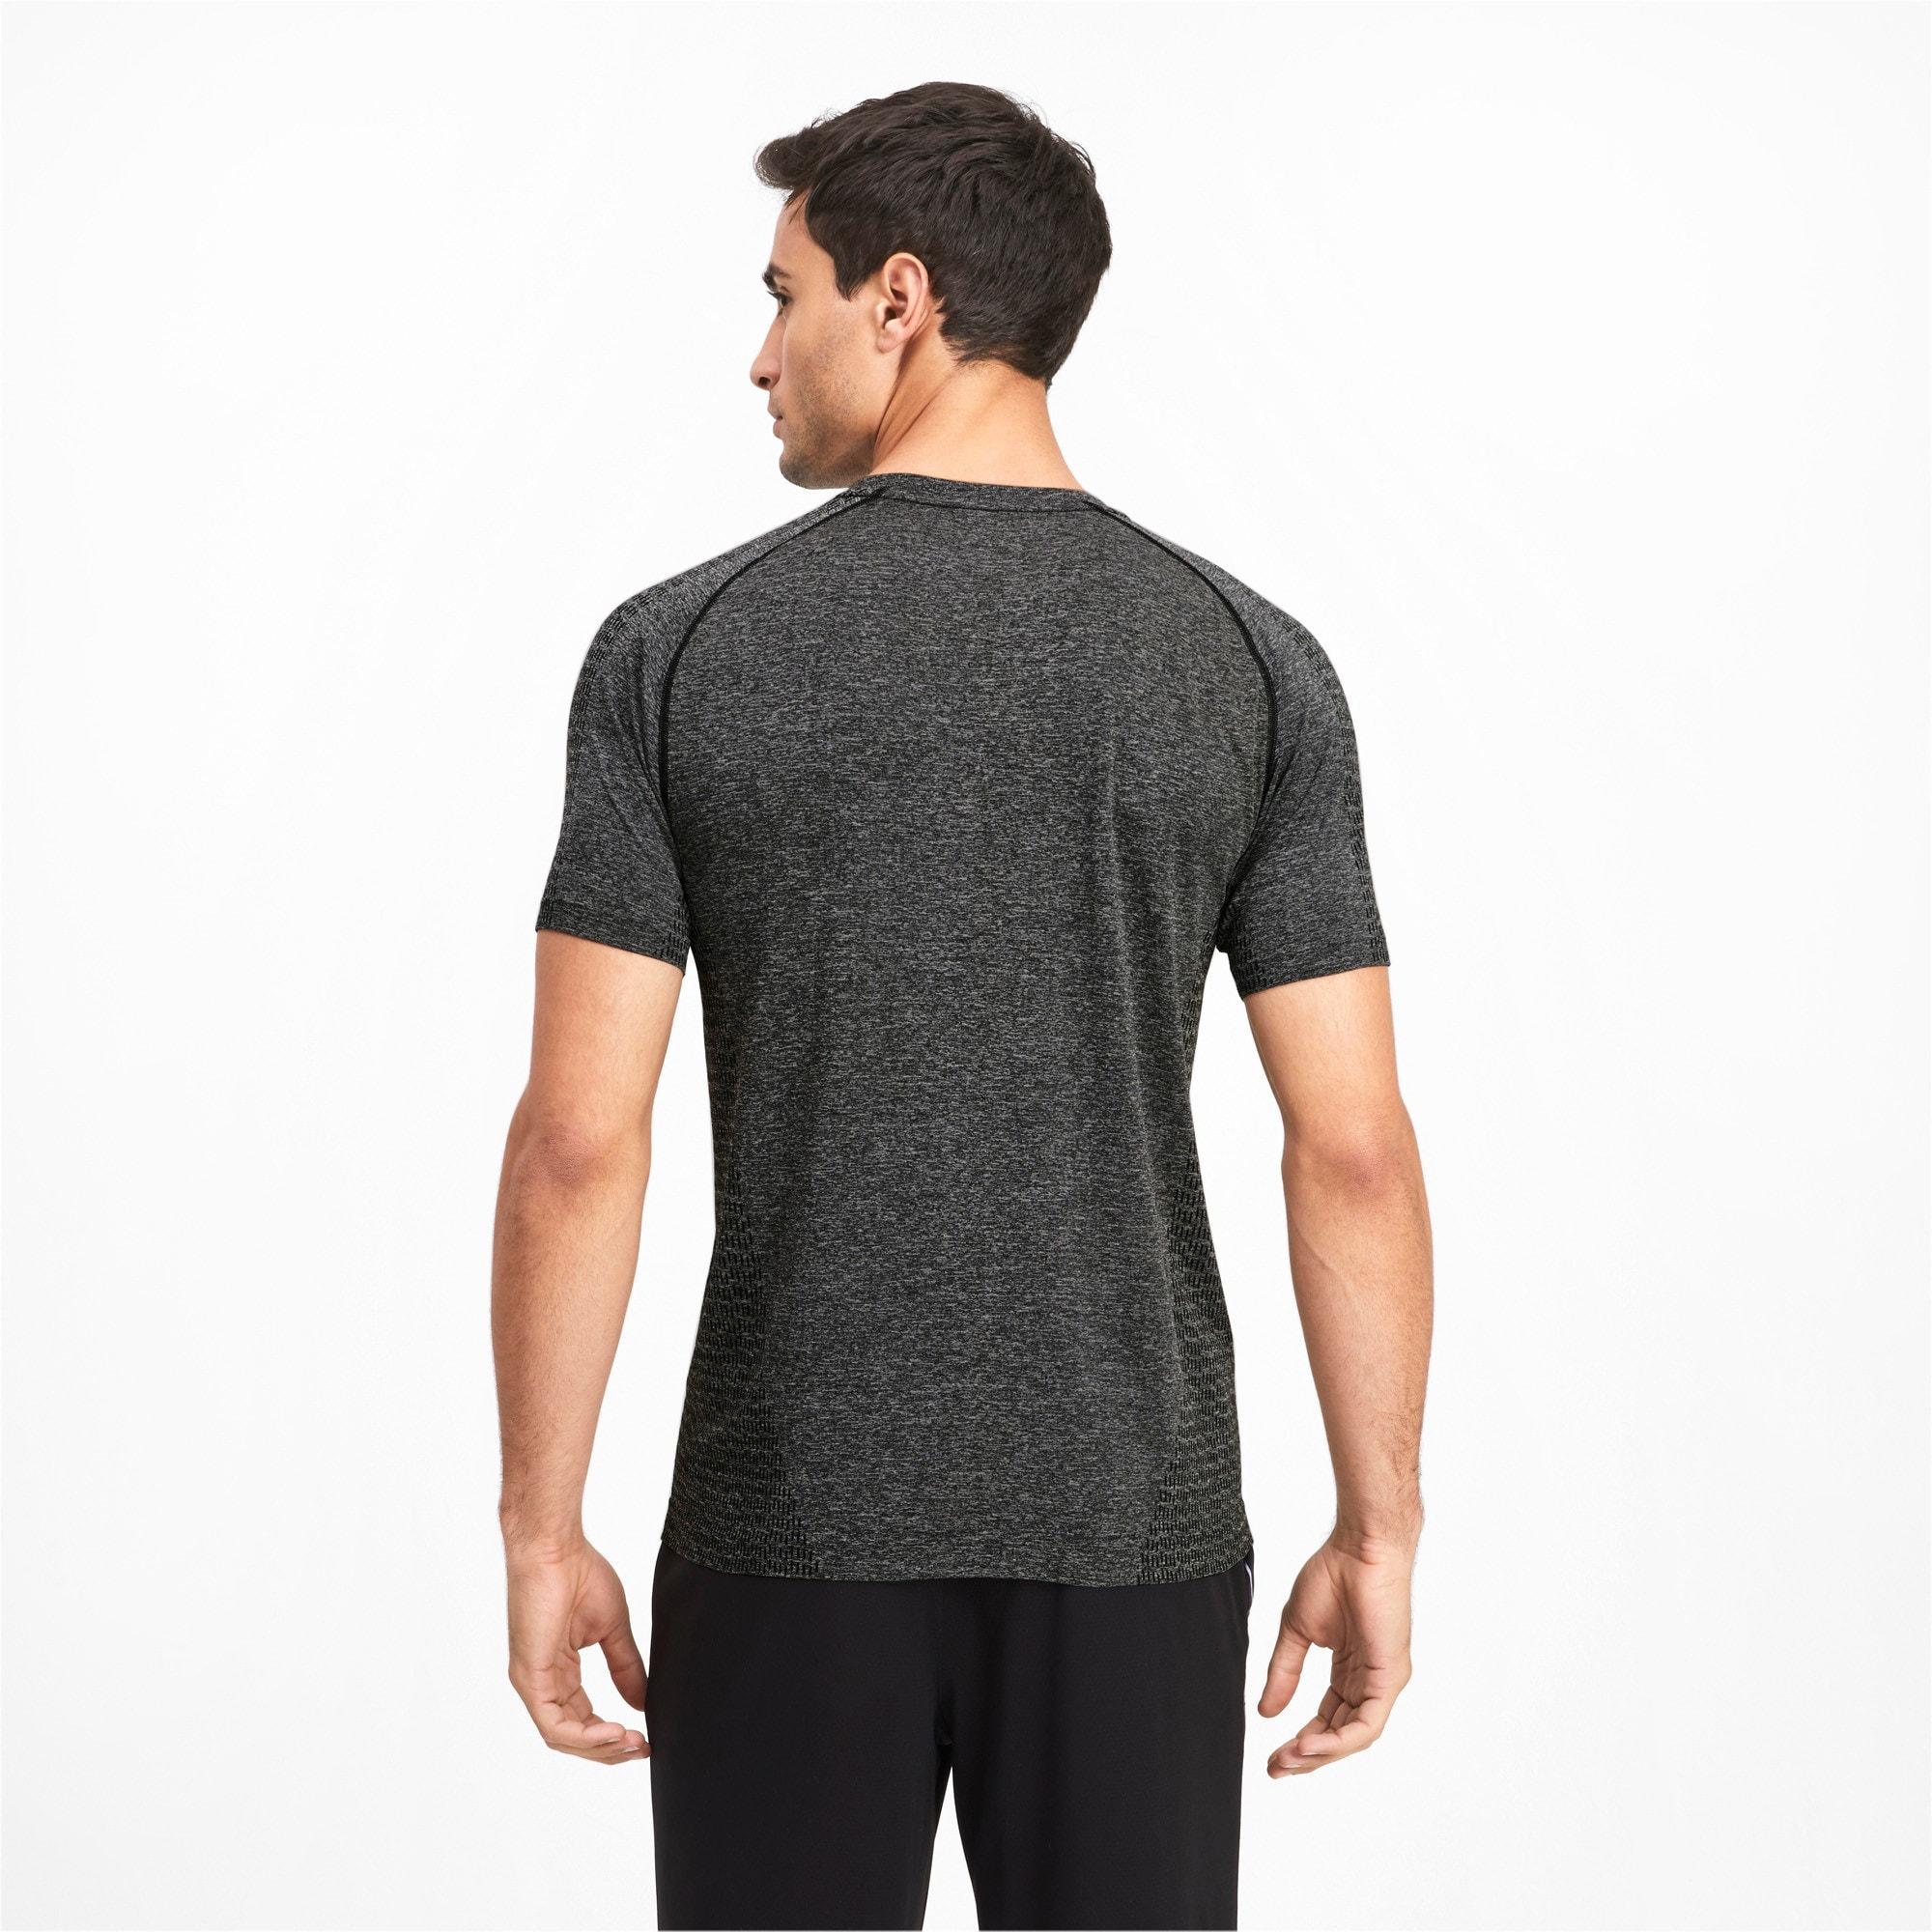 Thumbnail 2 of Tec Sports evoKNIT Men's Basic Tee, Puma Black, medium-IND